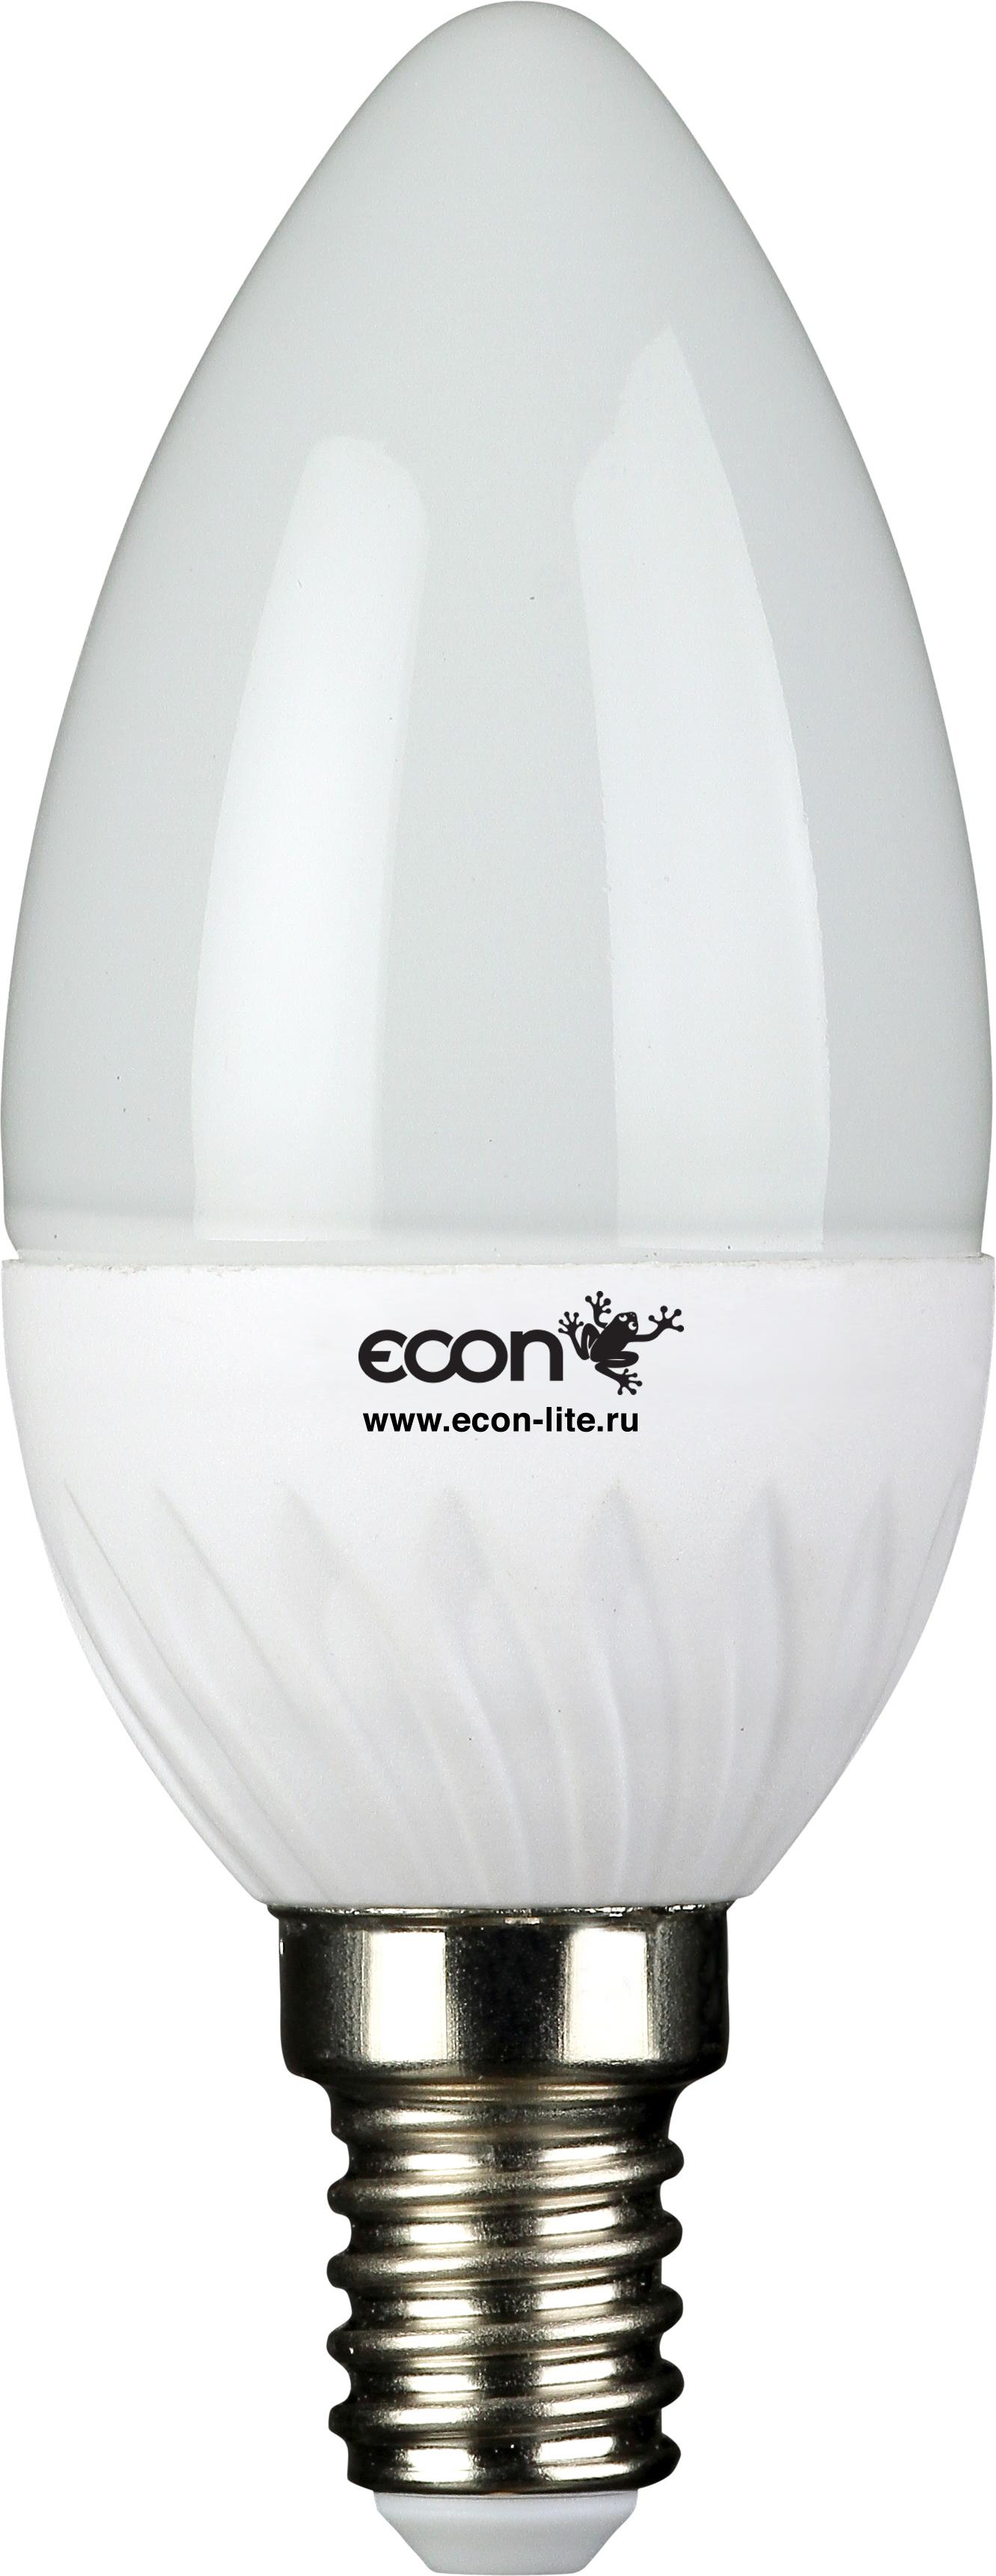 Лампа светодиодная Econ Led cn 5Вт e14 4200k b35 лампочка econ led cnt 7w 3000k e27 b35 27121